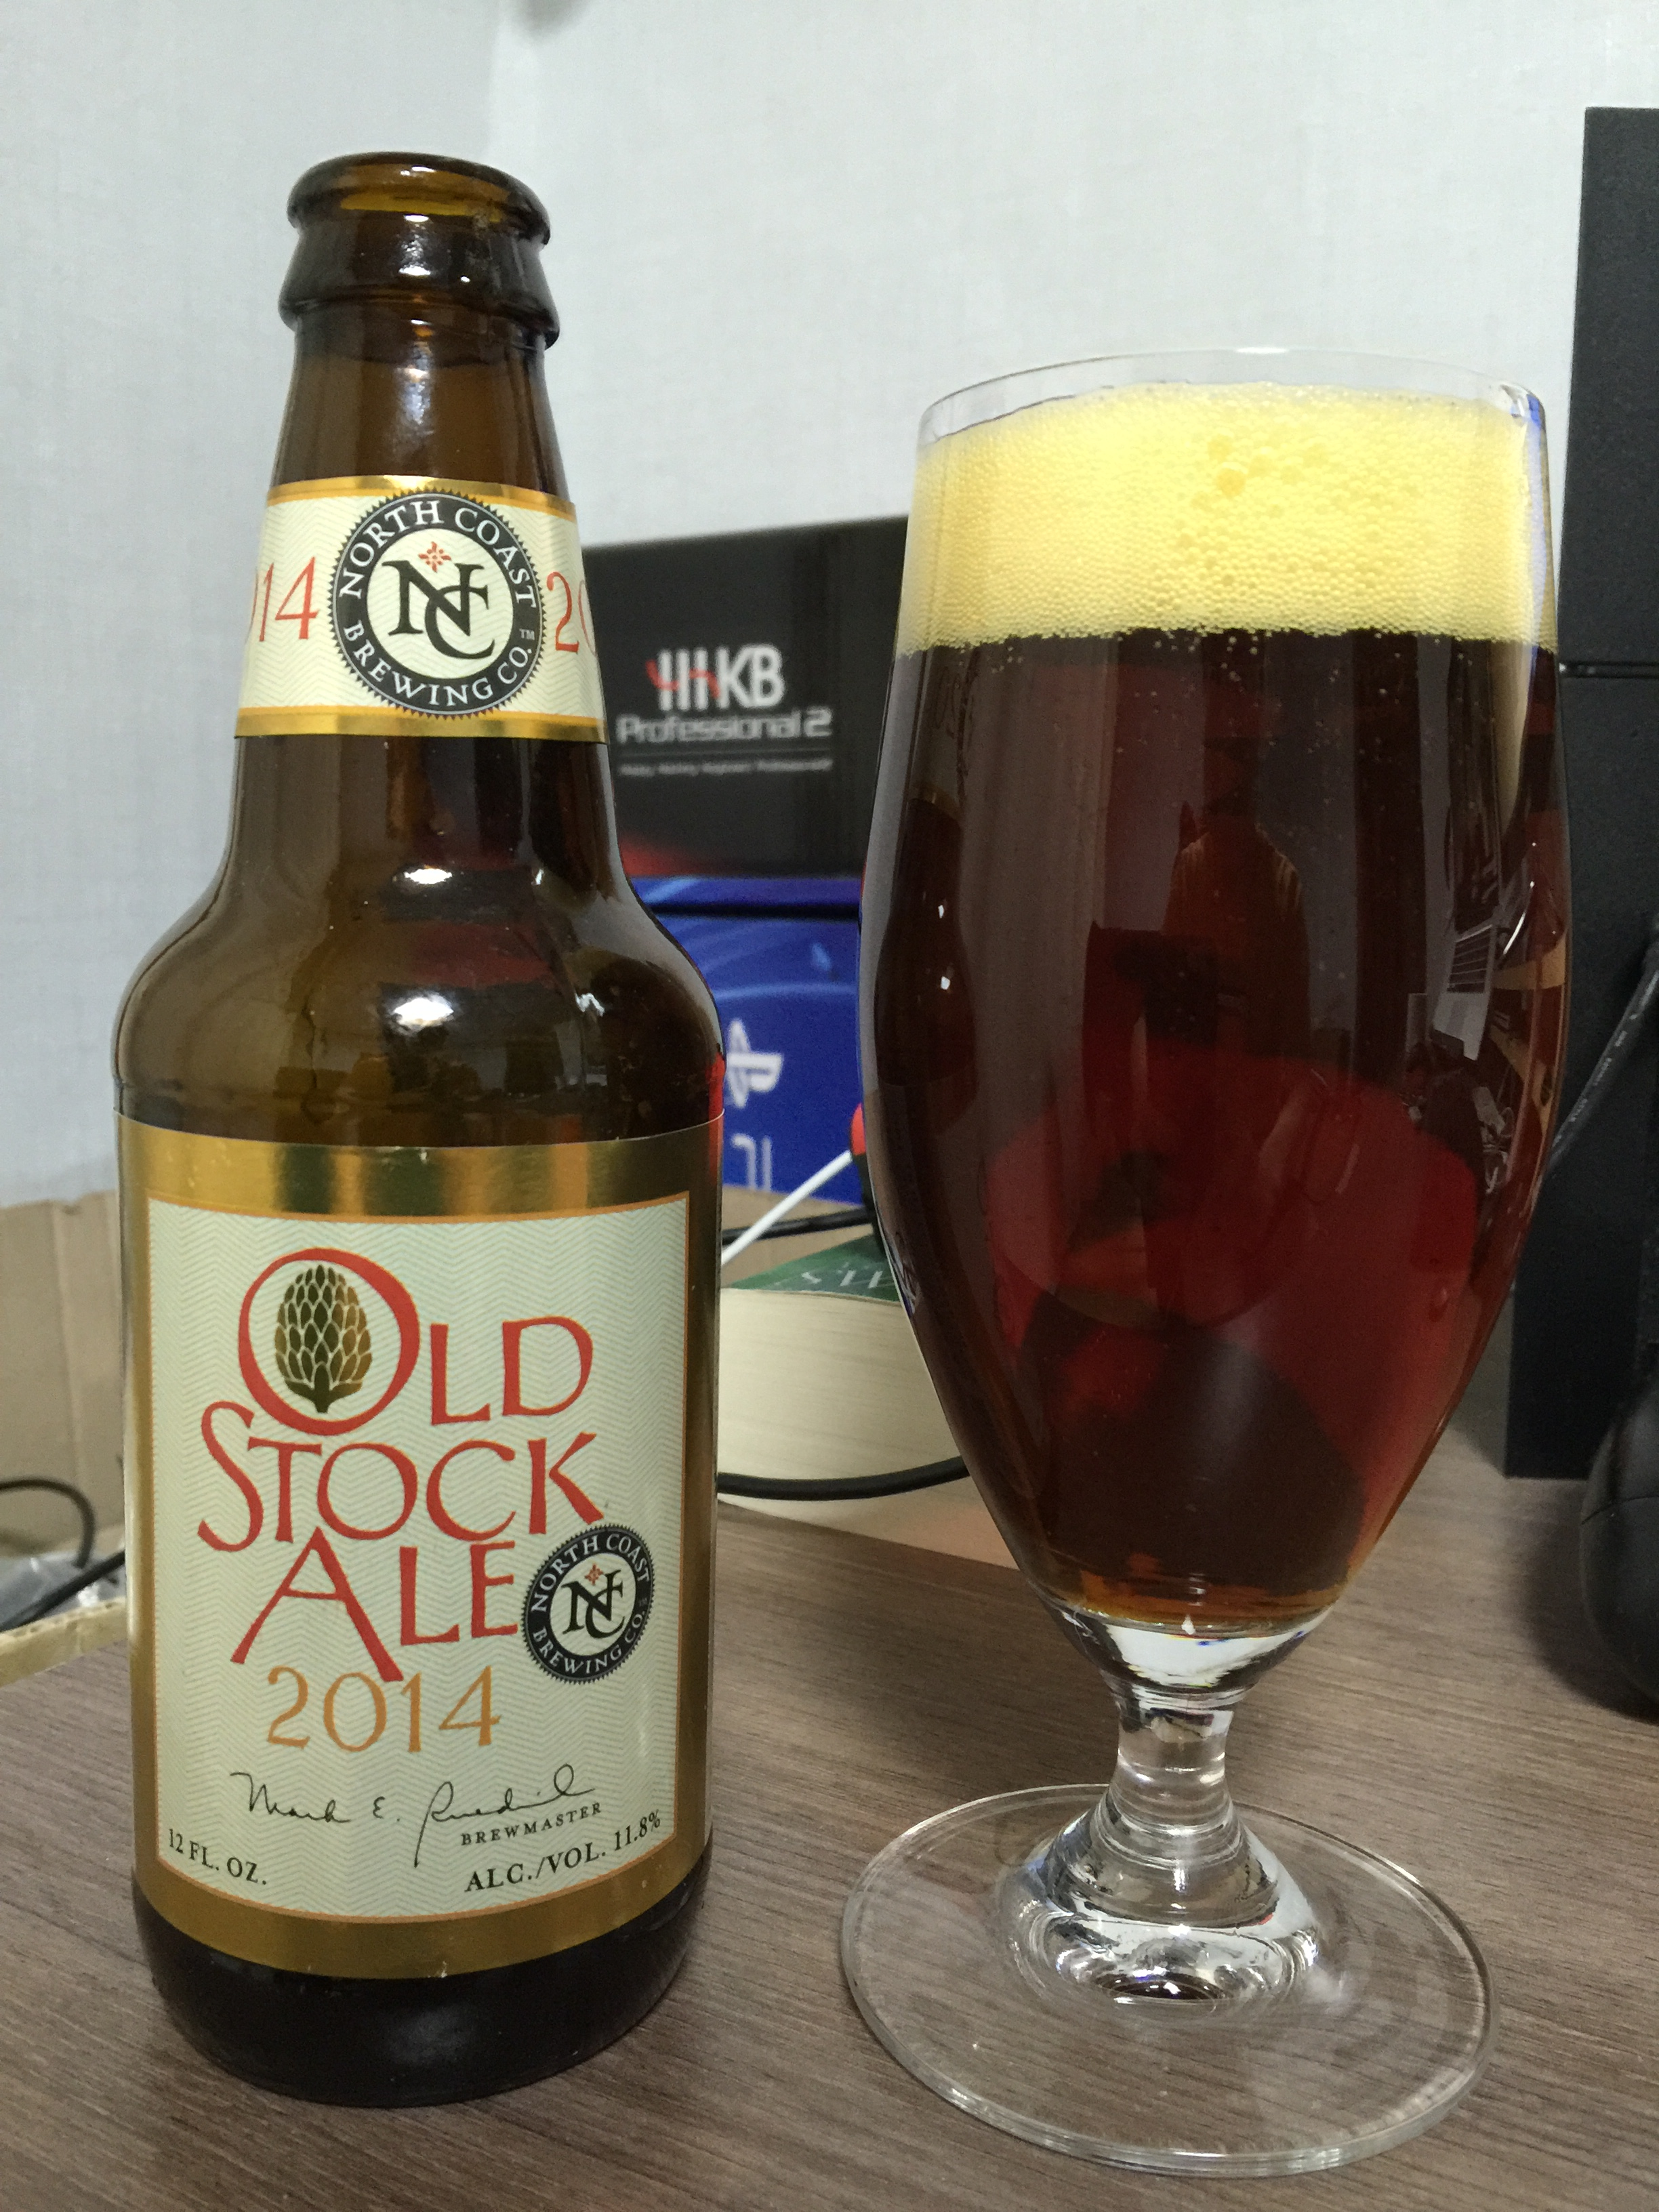 North Coast Old Stock Ale (2014)